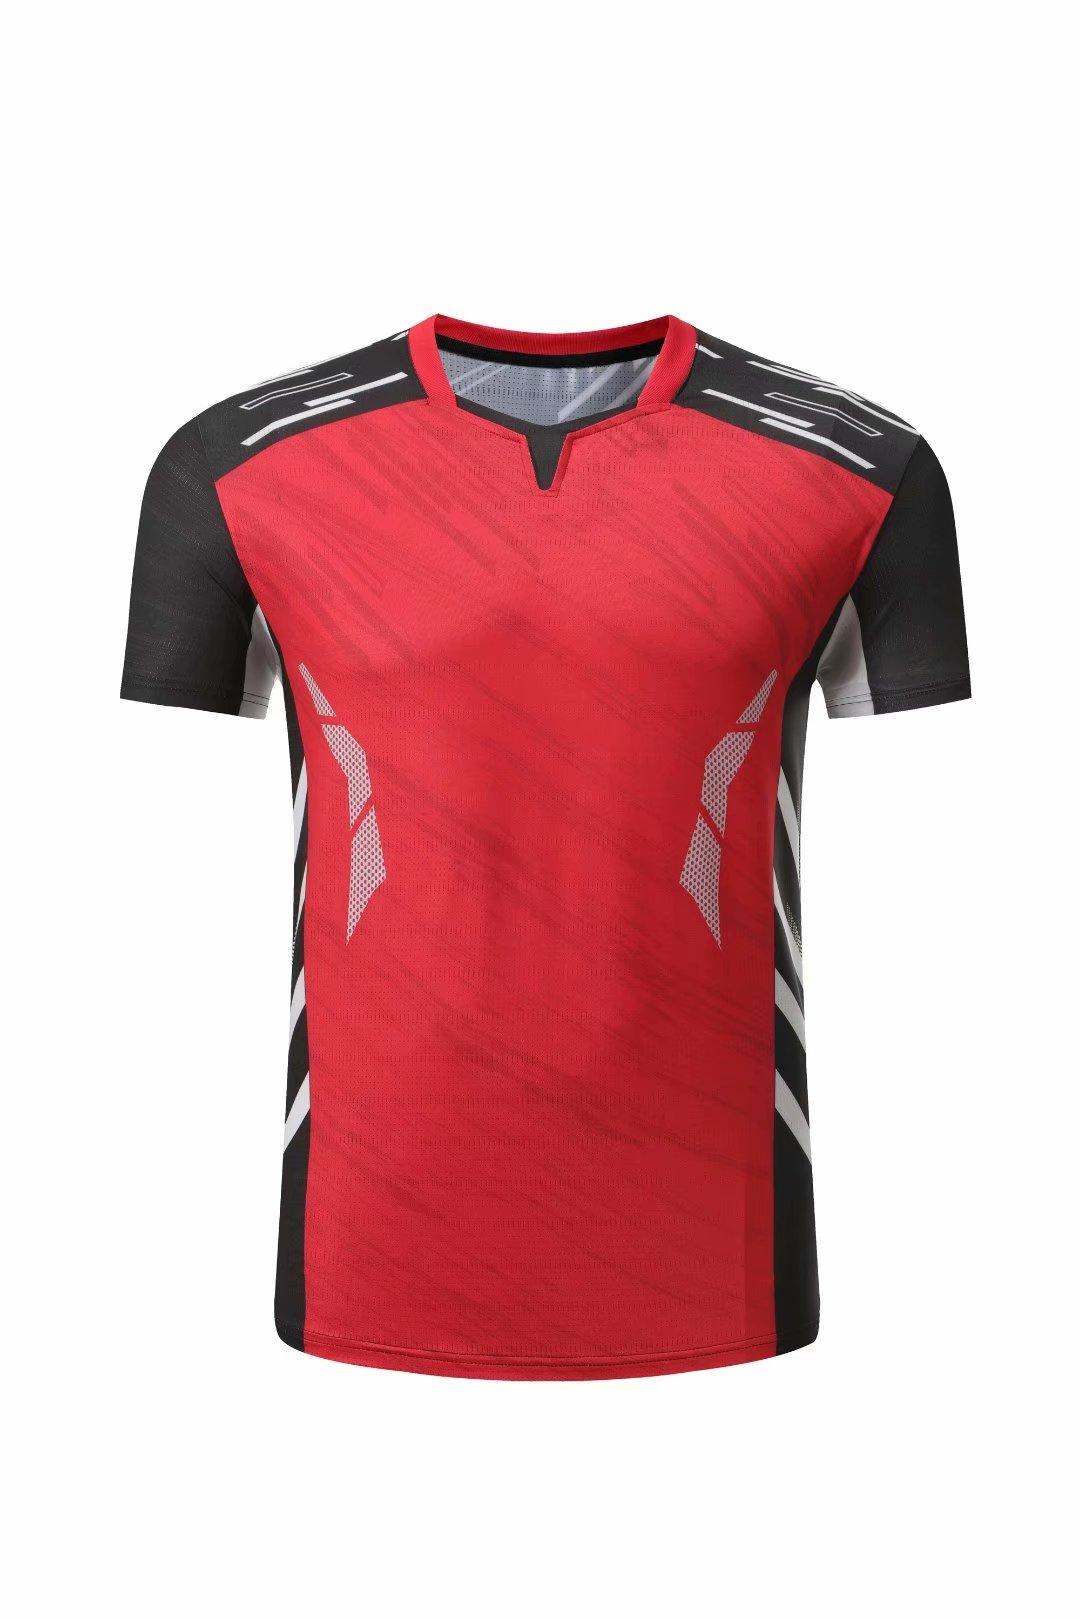 # 346 Tennis Shirt Blank Badminton Jersey Hommes Femmes Sportswear Former FullTlecock Running Sports Shirts Homme